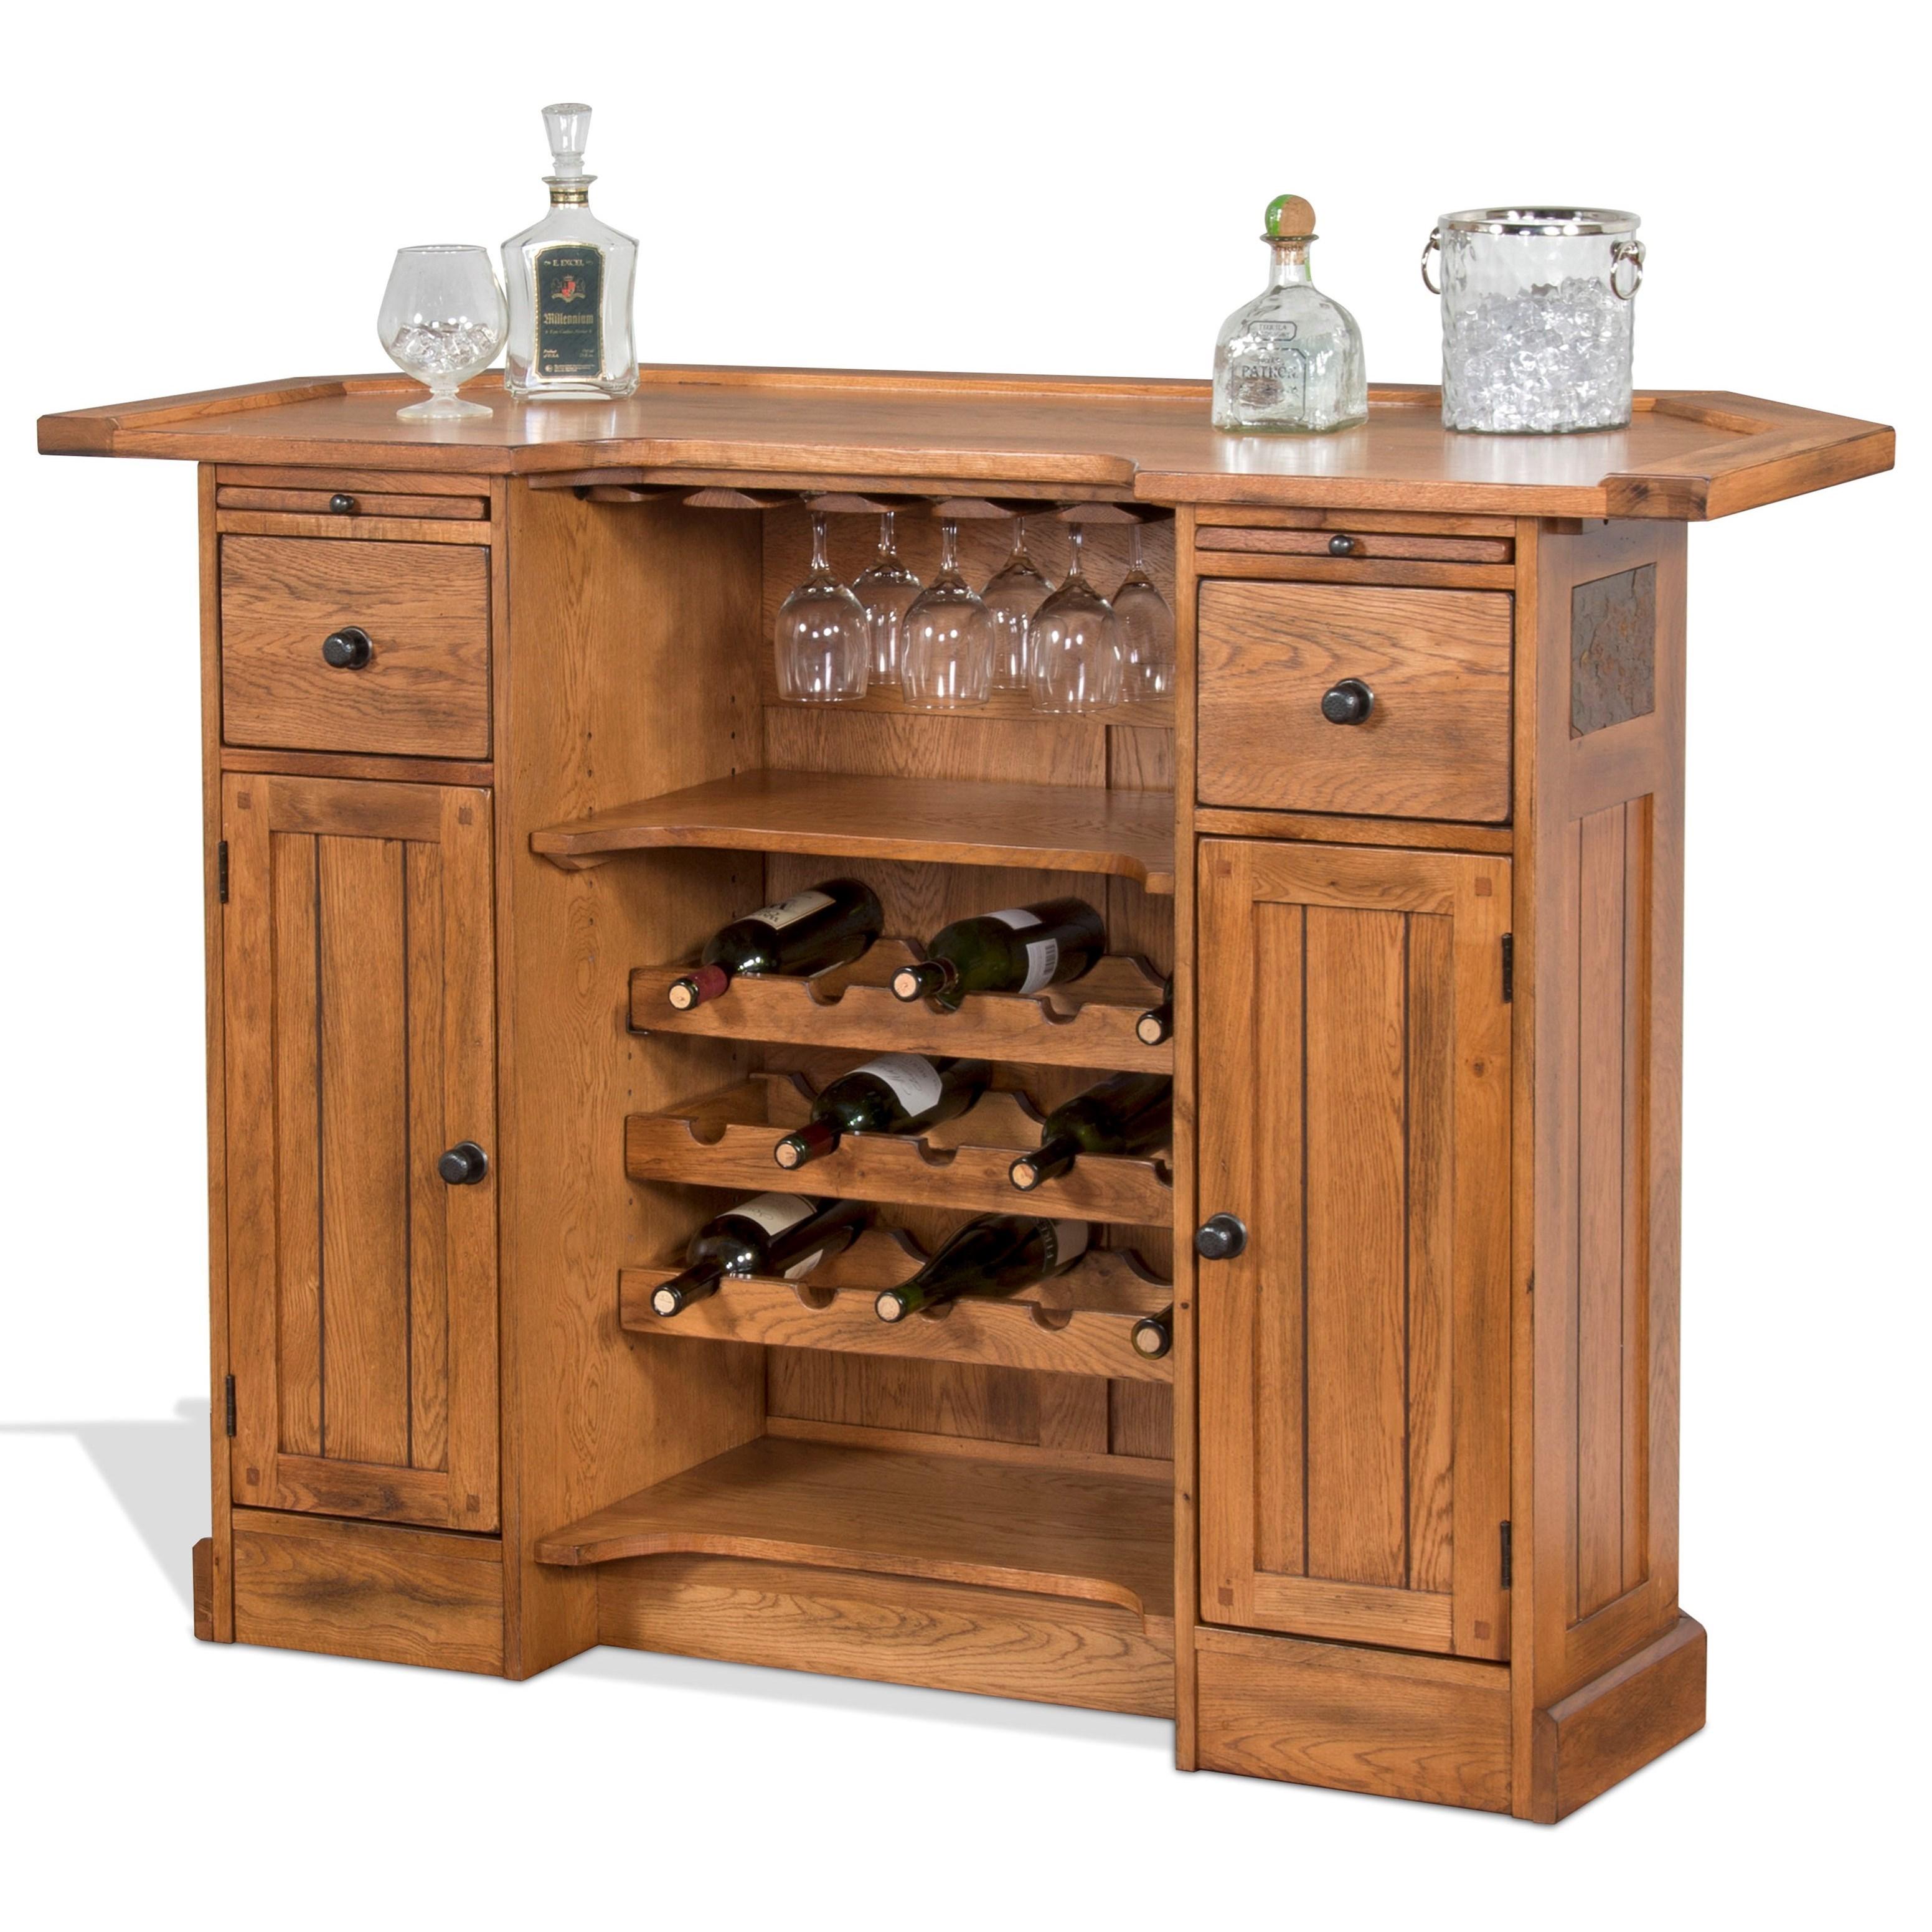 High Quality Sunny Designs Sedona Rustic Oak Bar Zak 39 S Fine Furniture For Sunny  Designs Furniture Dealers